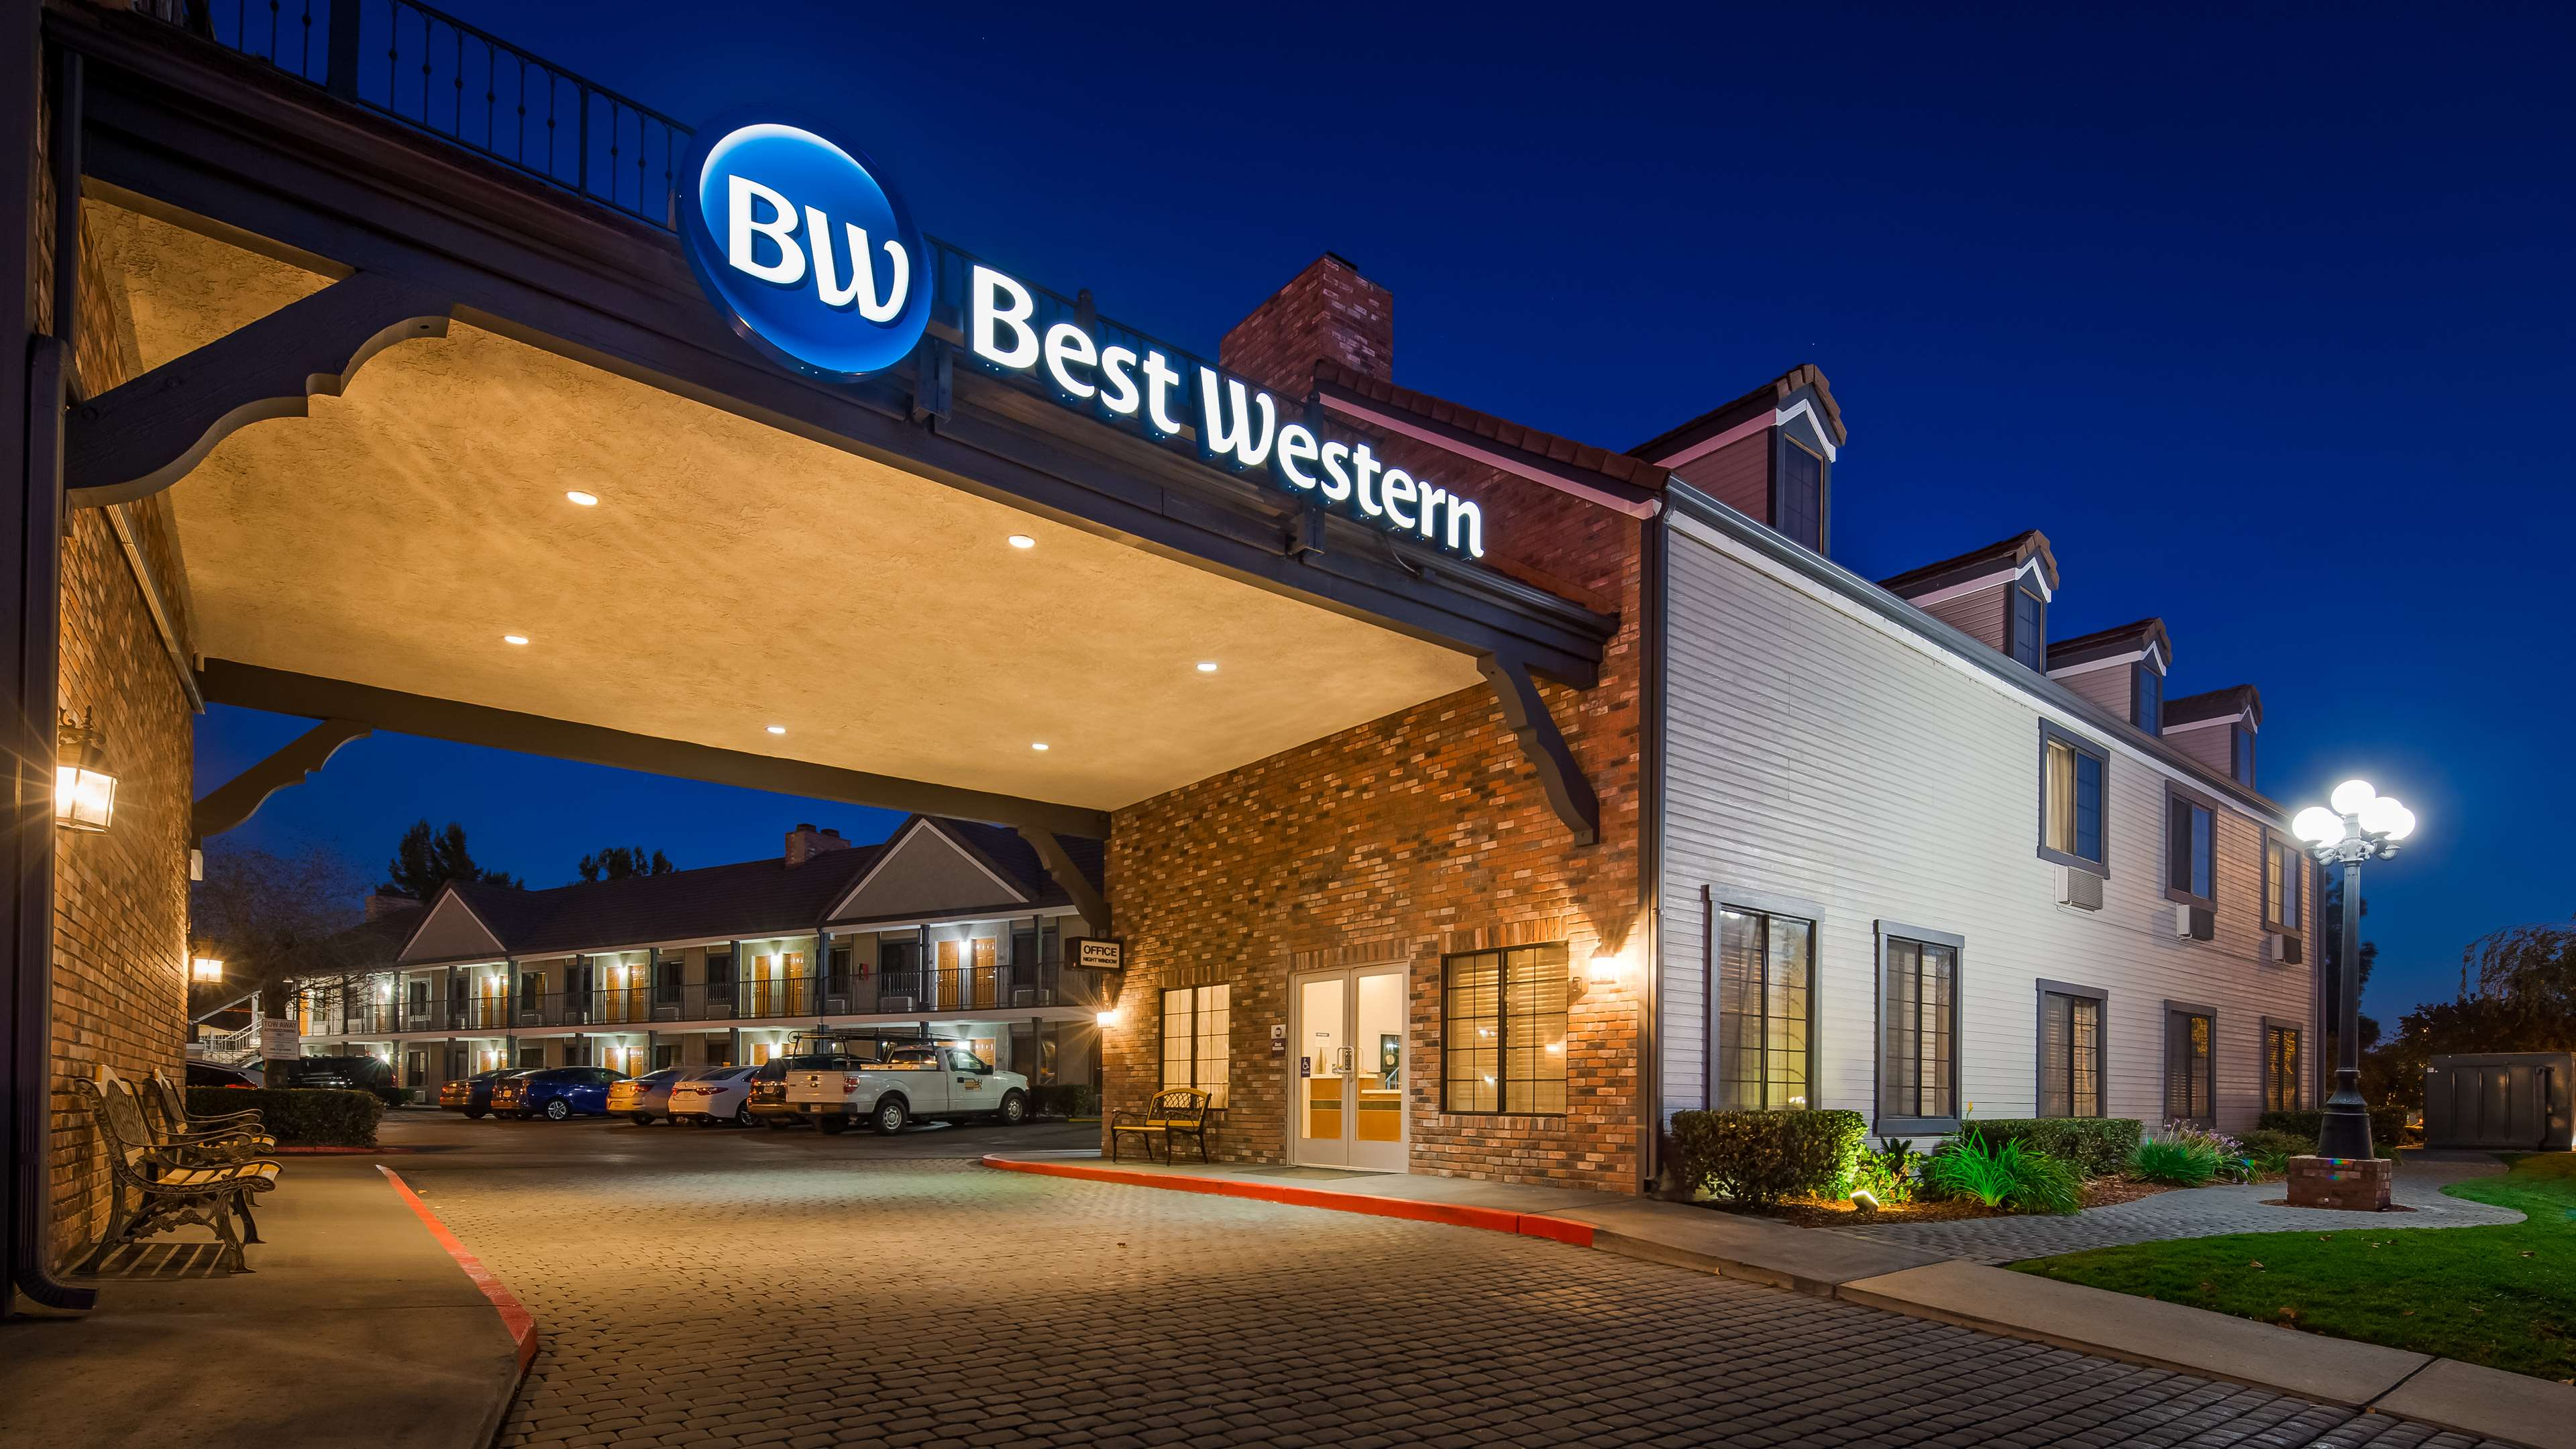 Best Western Country Inn image 30